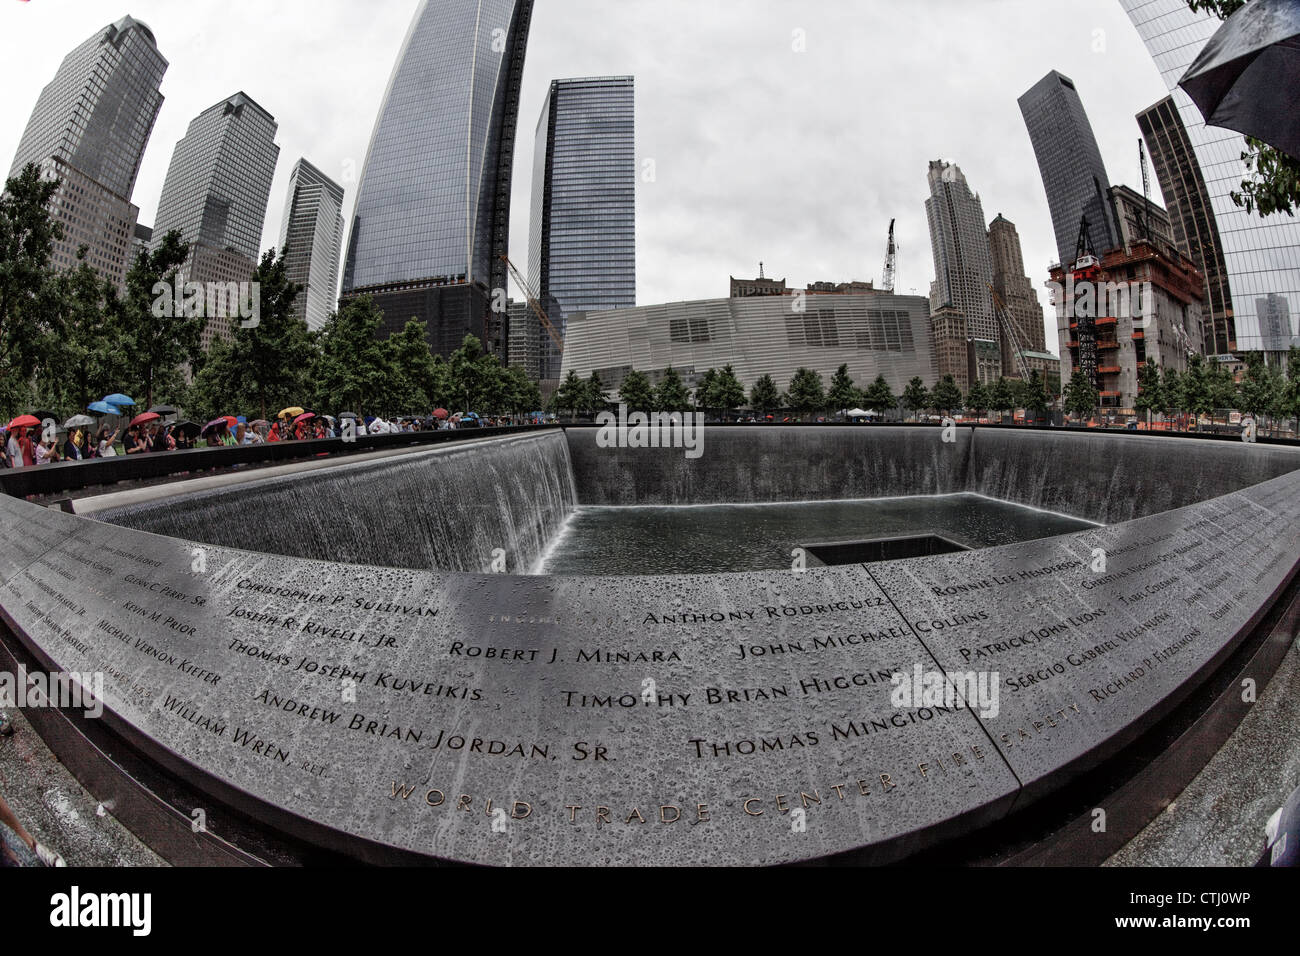 911 World Trade Center Memorial , Ground Zero, Manhattan, New York - Stock Image